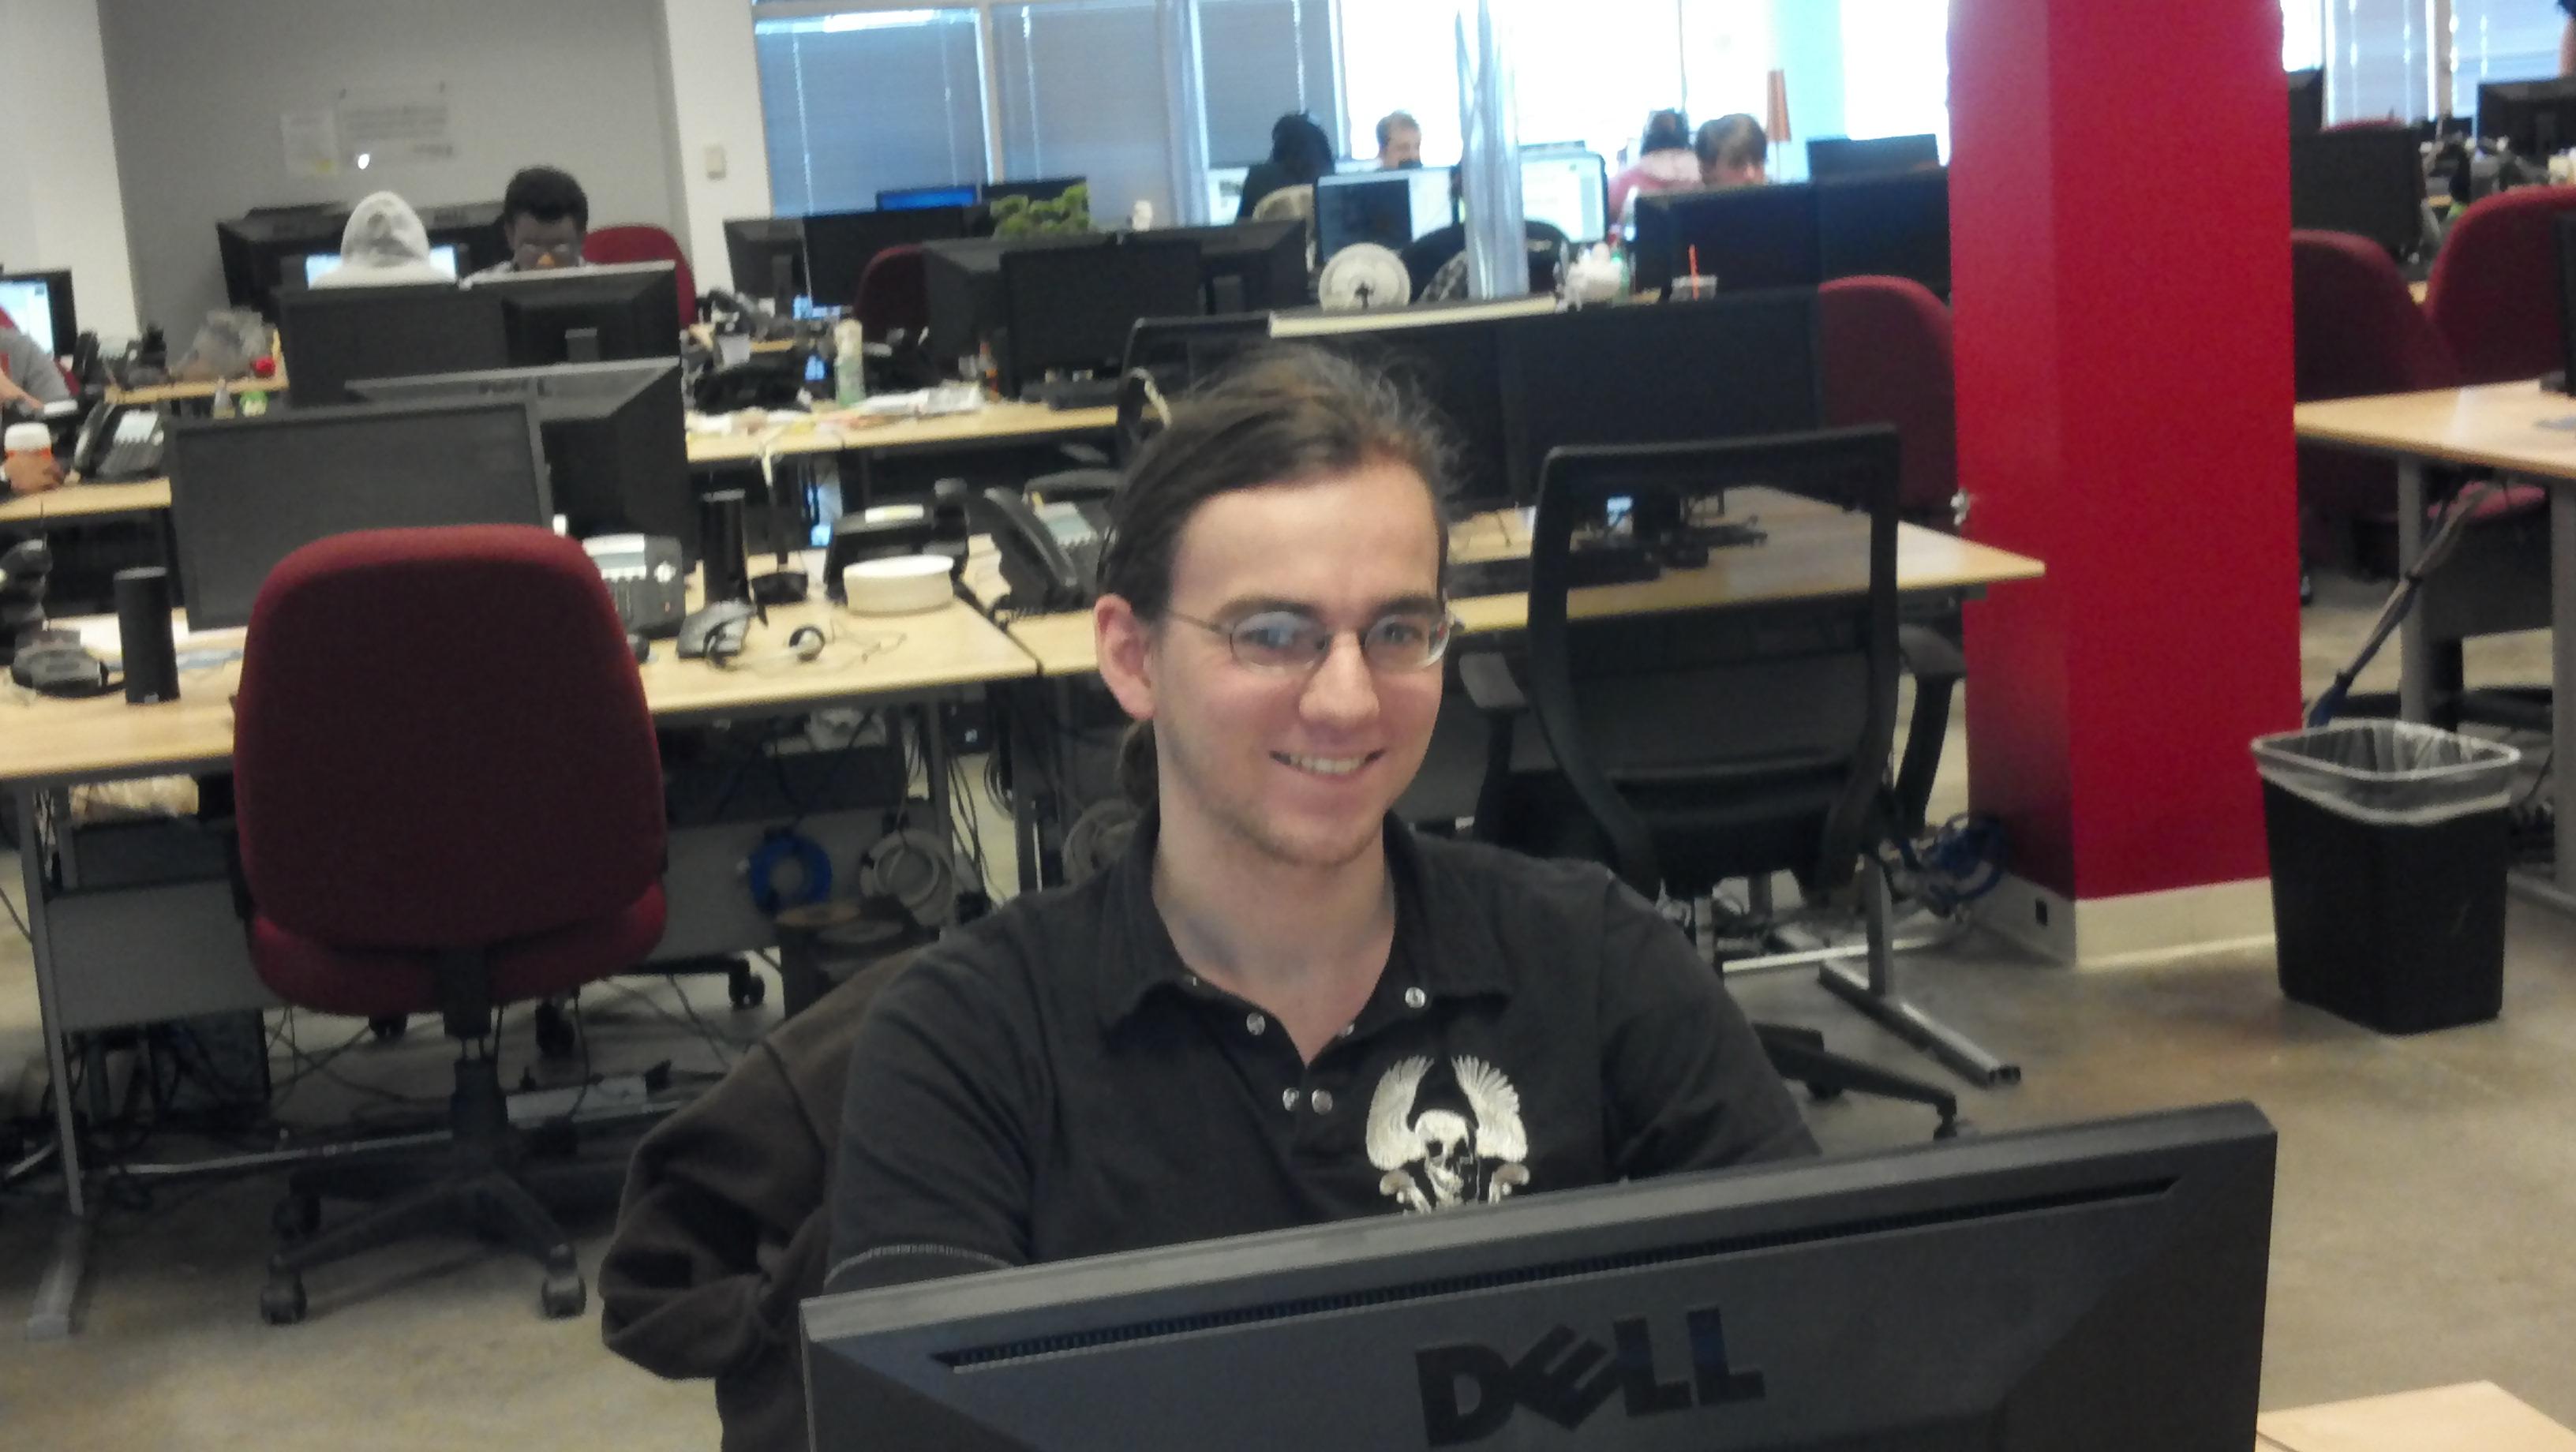 Will E. Tier 1 Technical Support